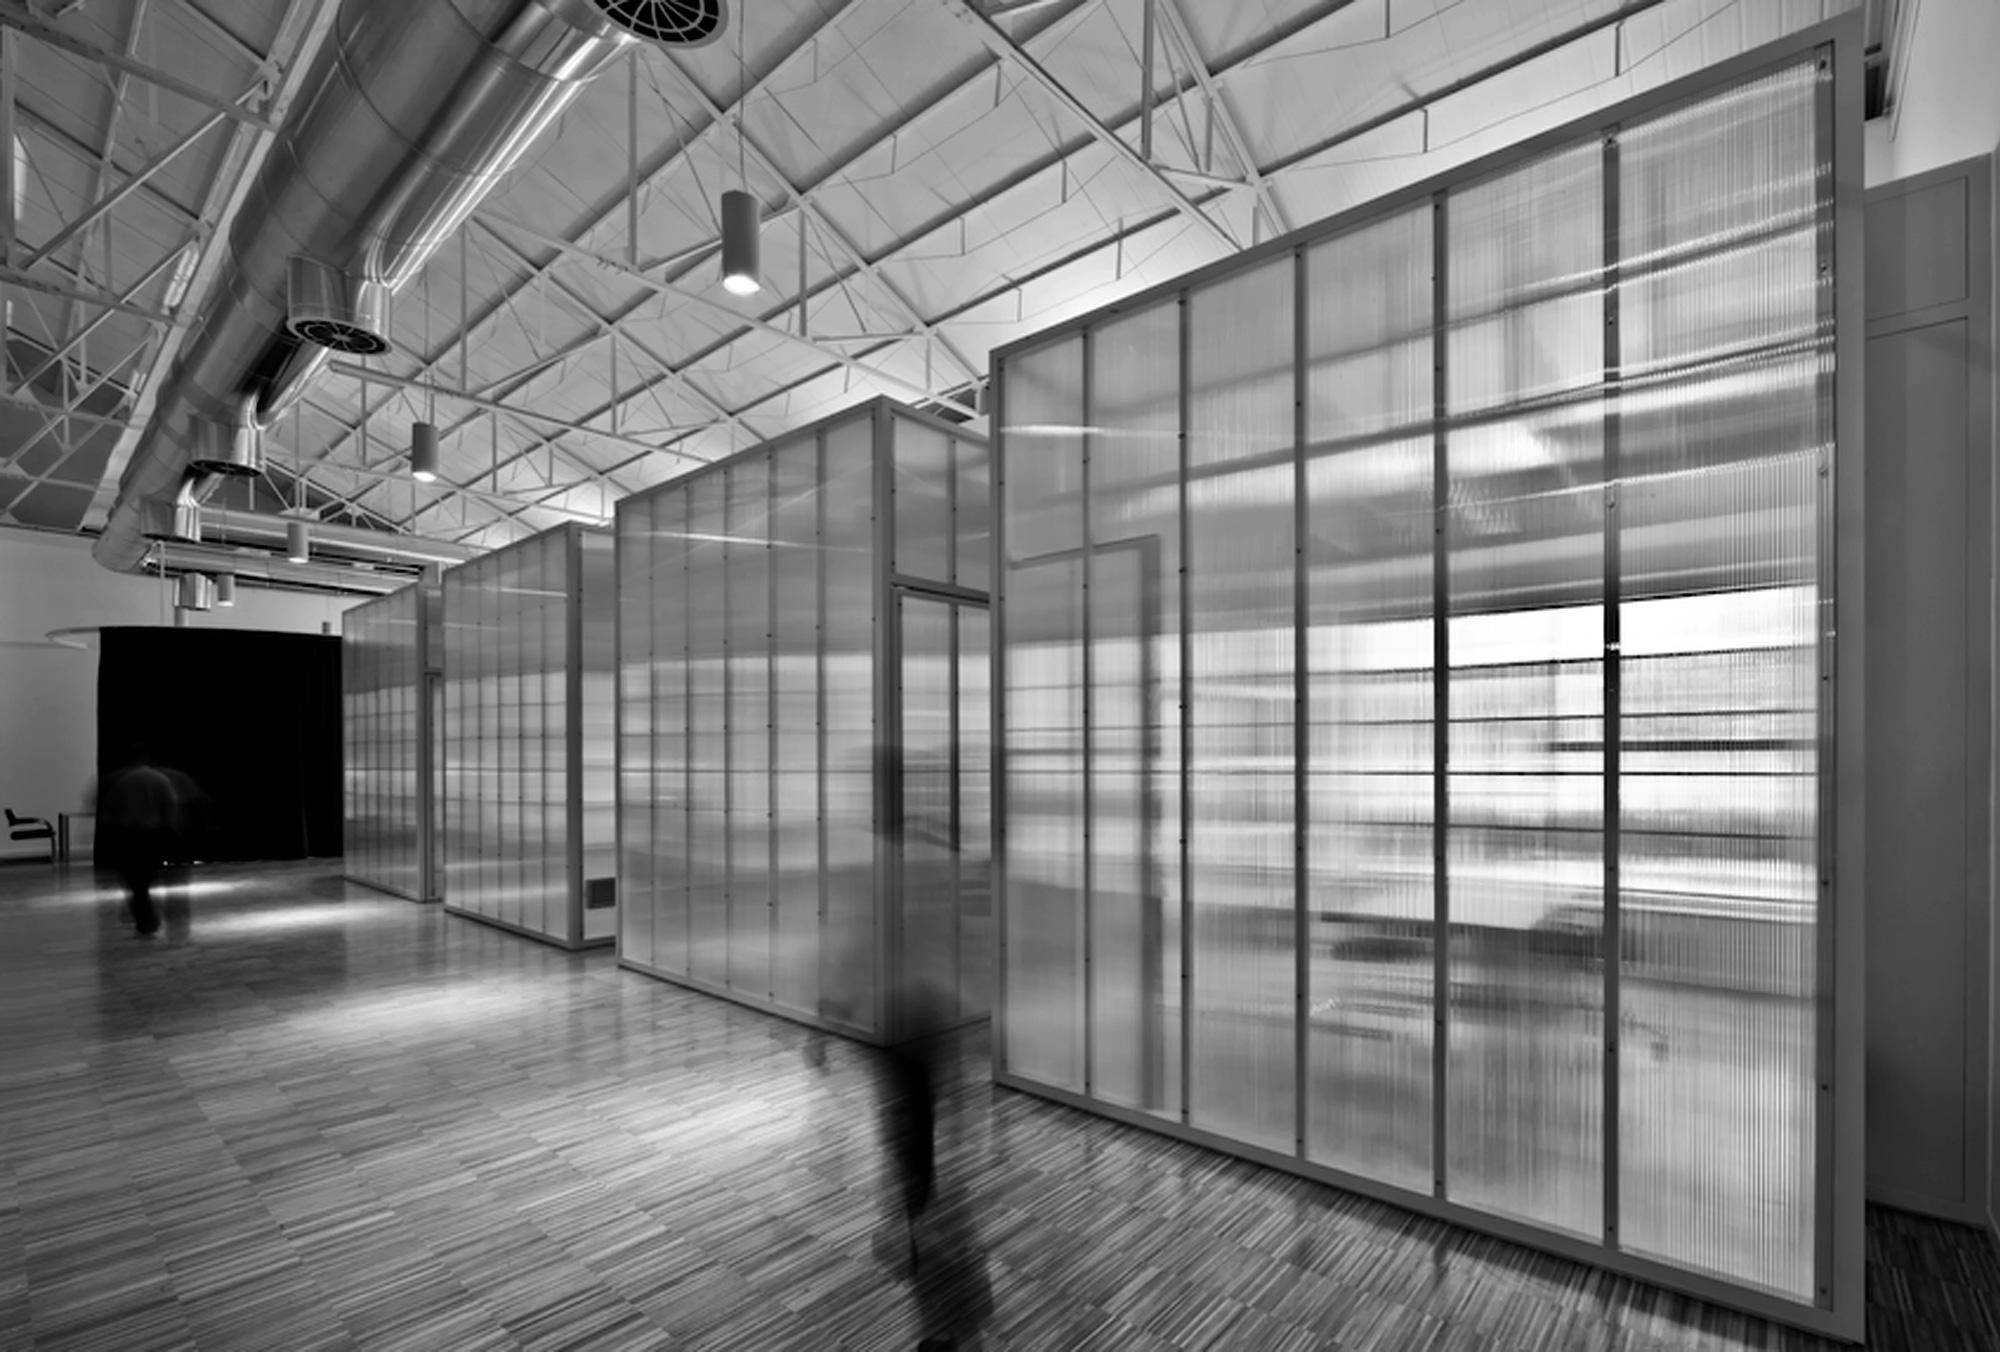 Bevilacqua Architects – Gimema Offices